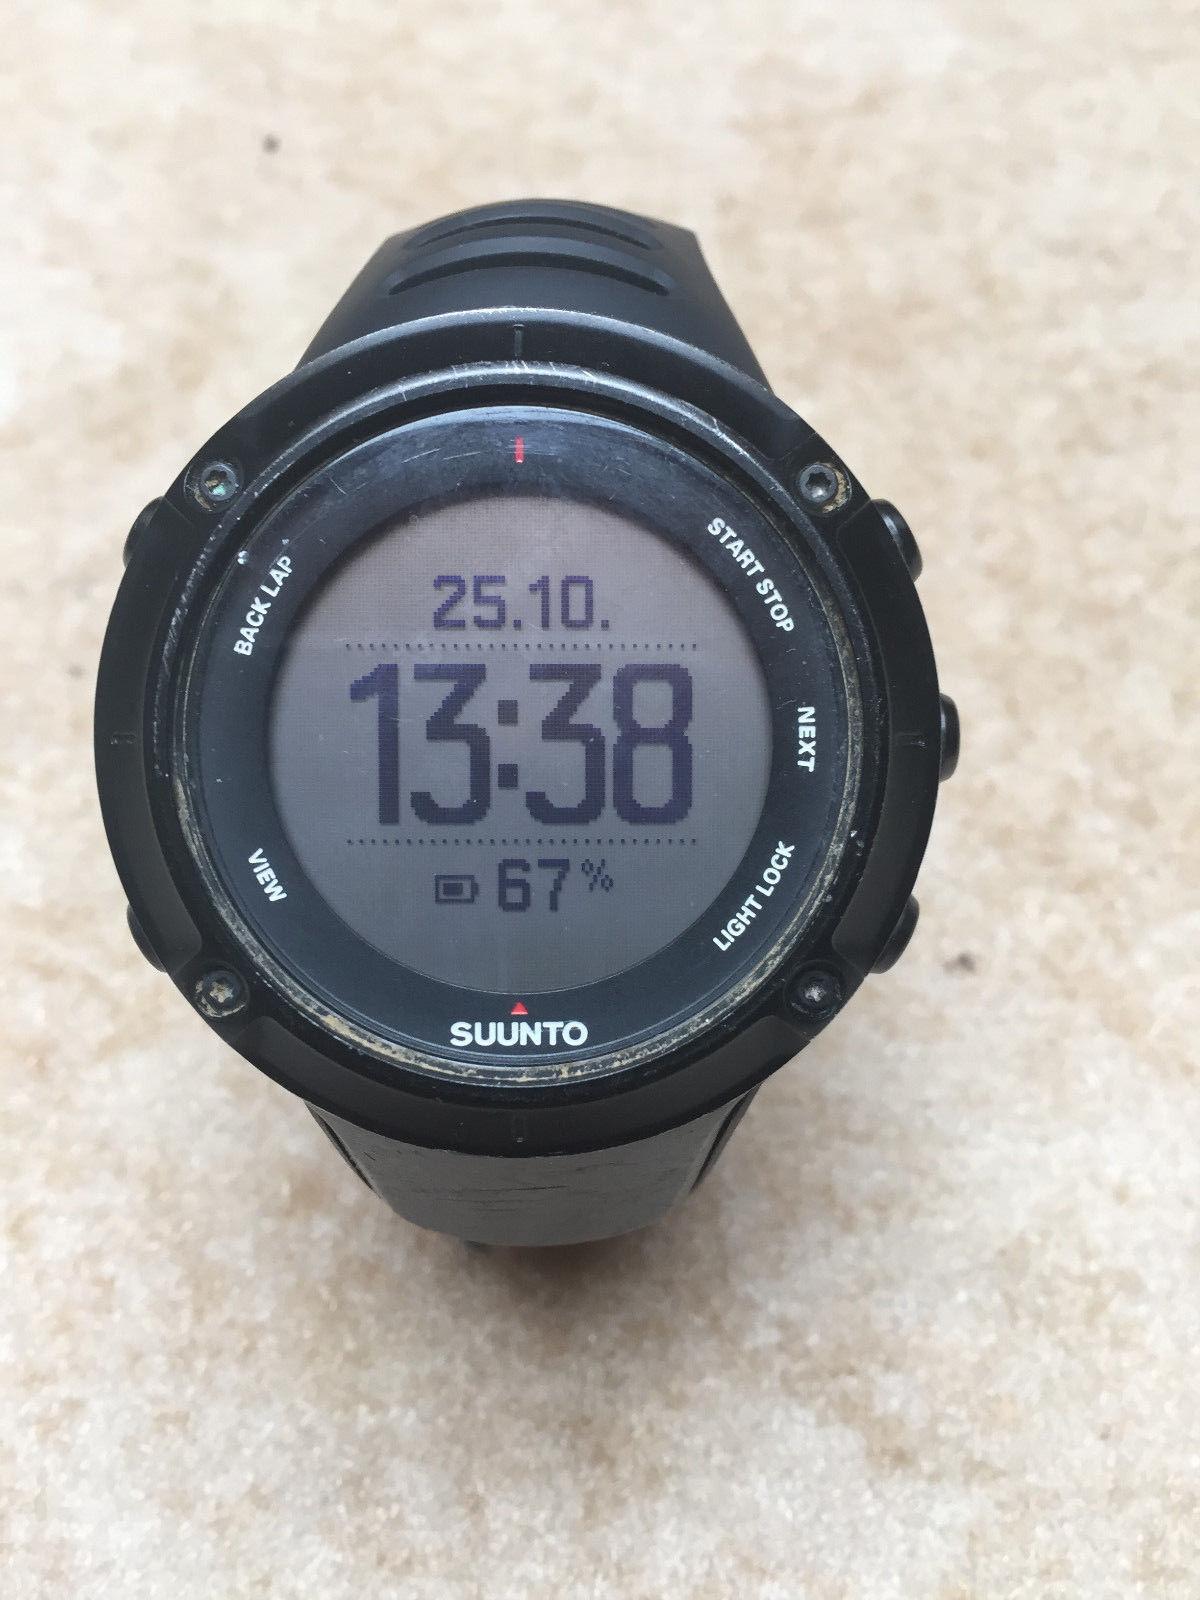 Suunto Ambit 3 Peak Black - Sportuhr GPS-Watch + Ladekabel